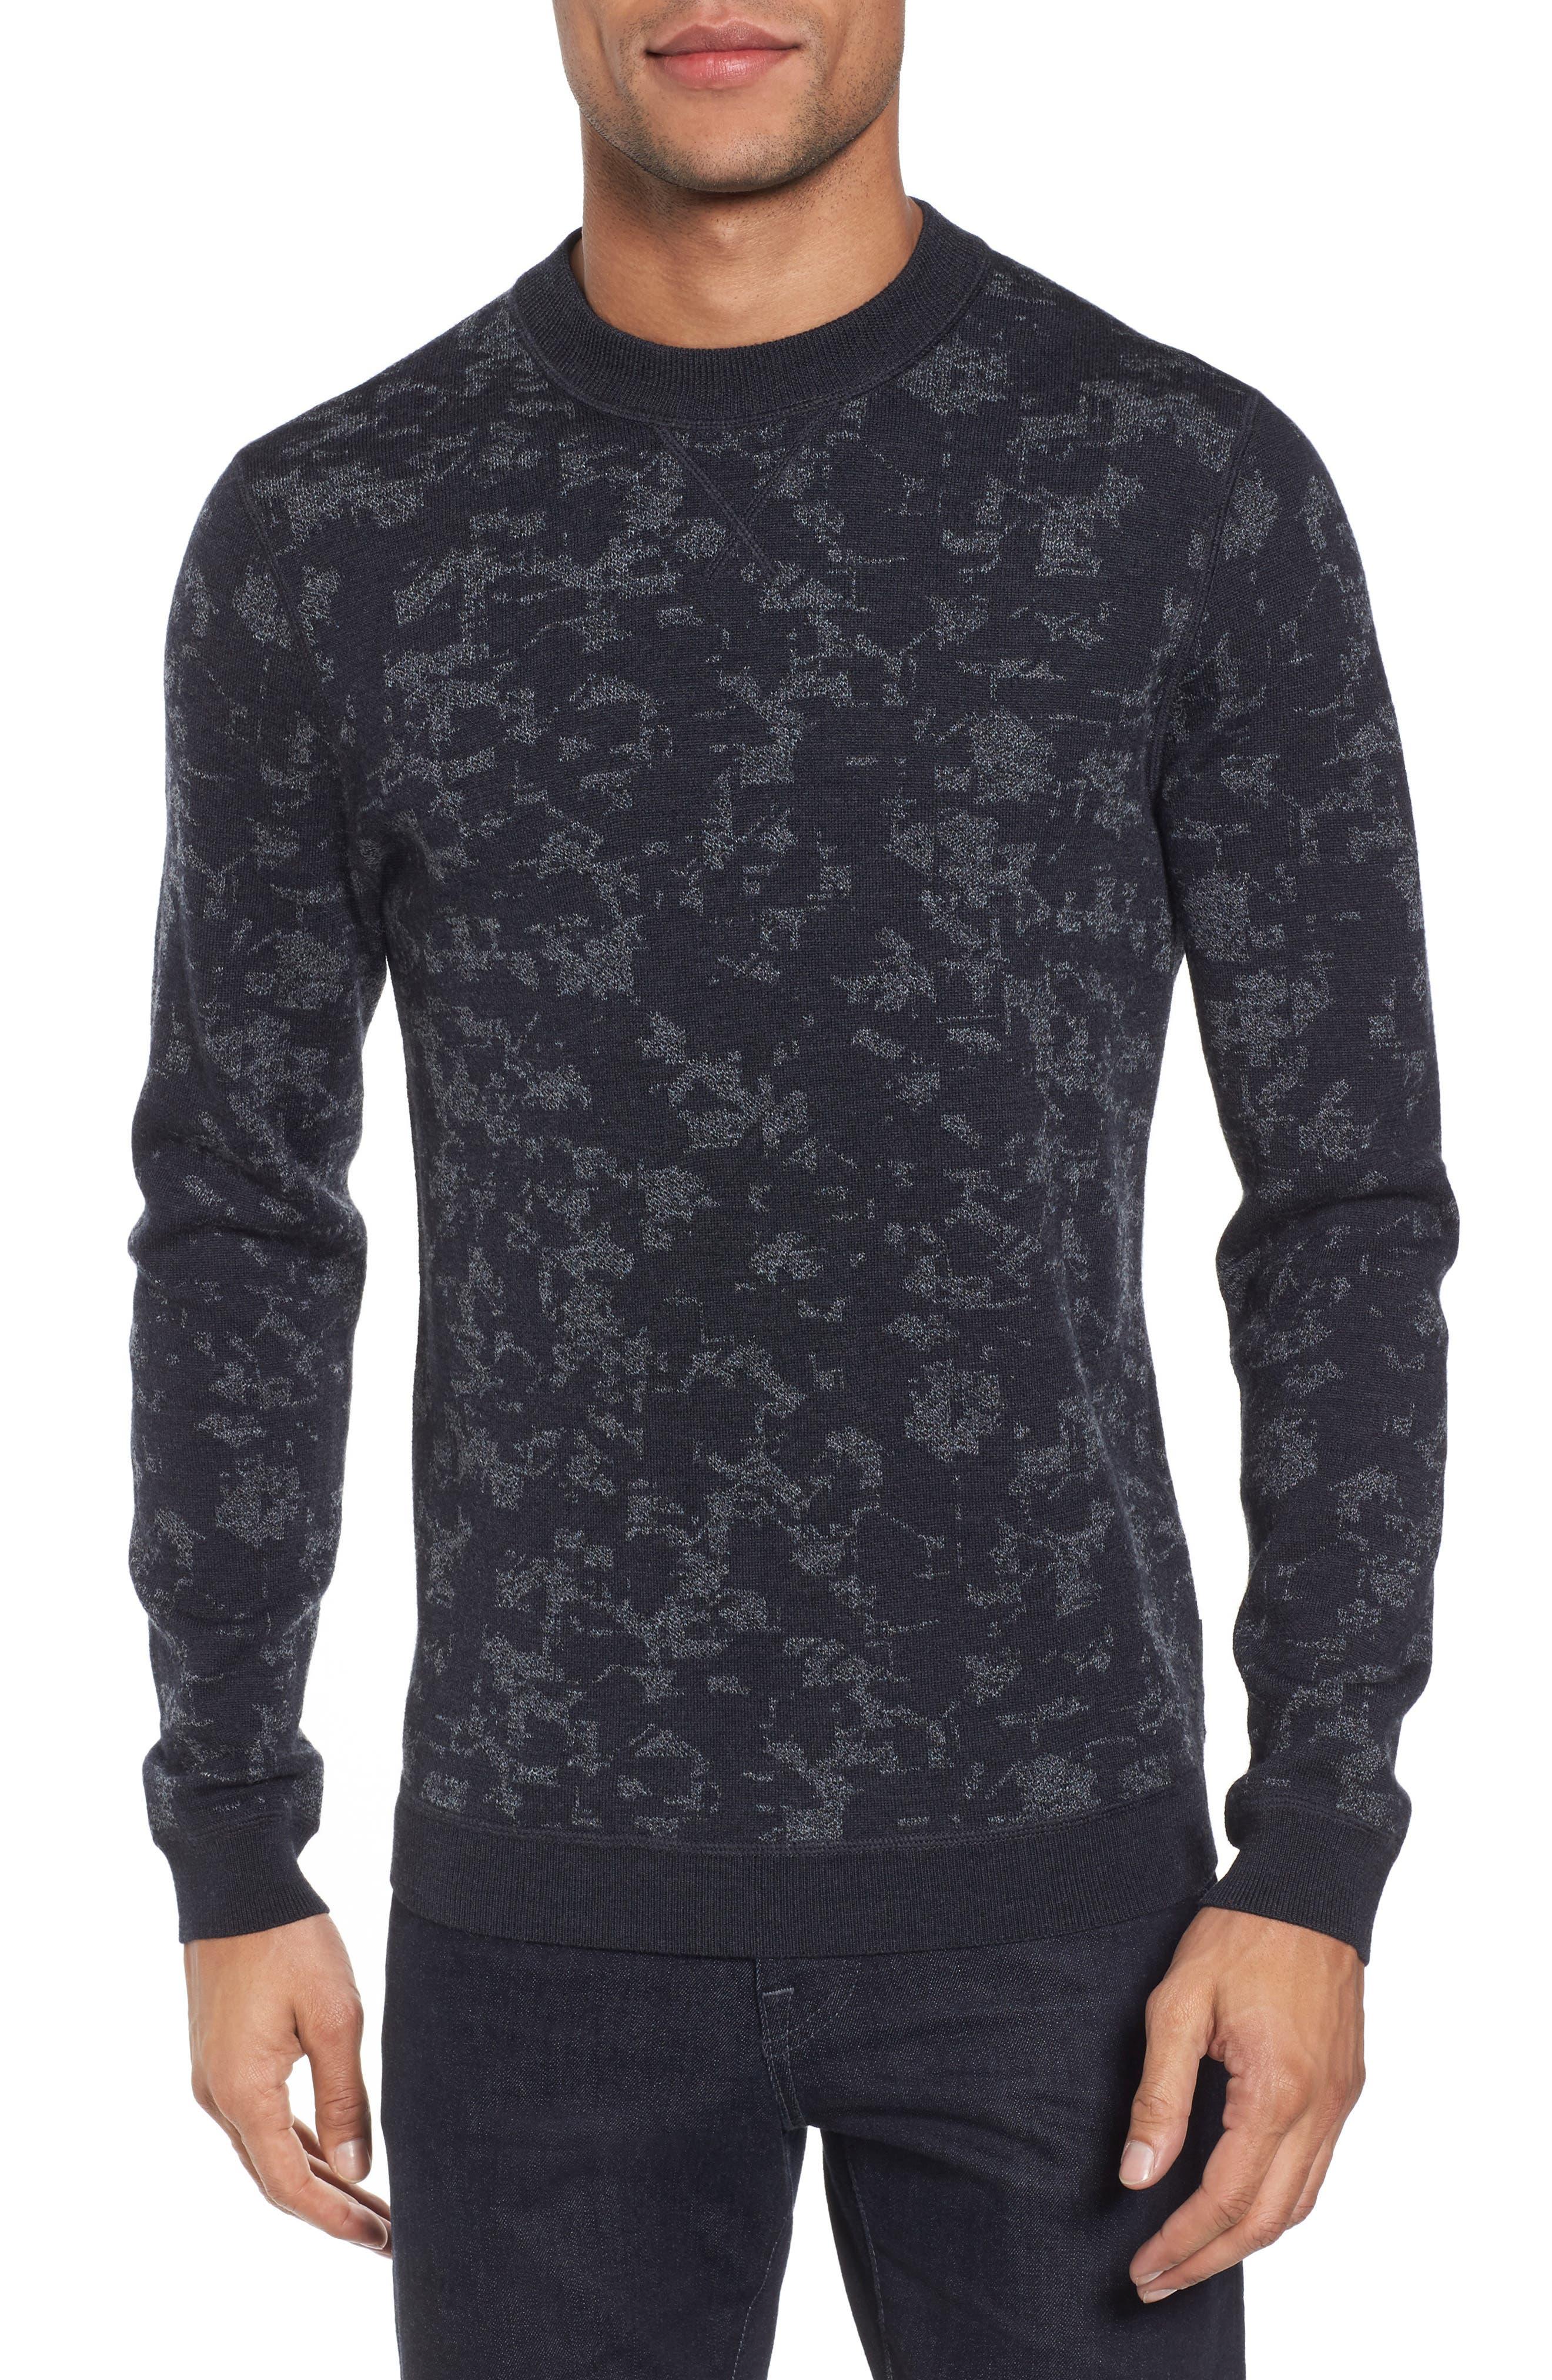 Gelato Jacquard Sweater,                             Main thumbnail 1, color,                             020